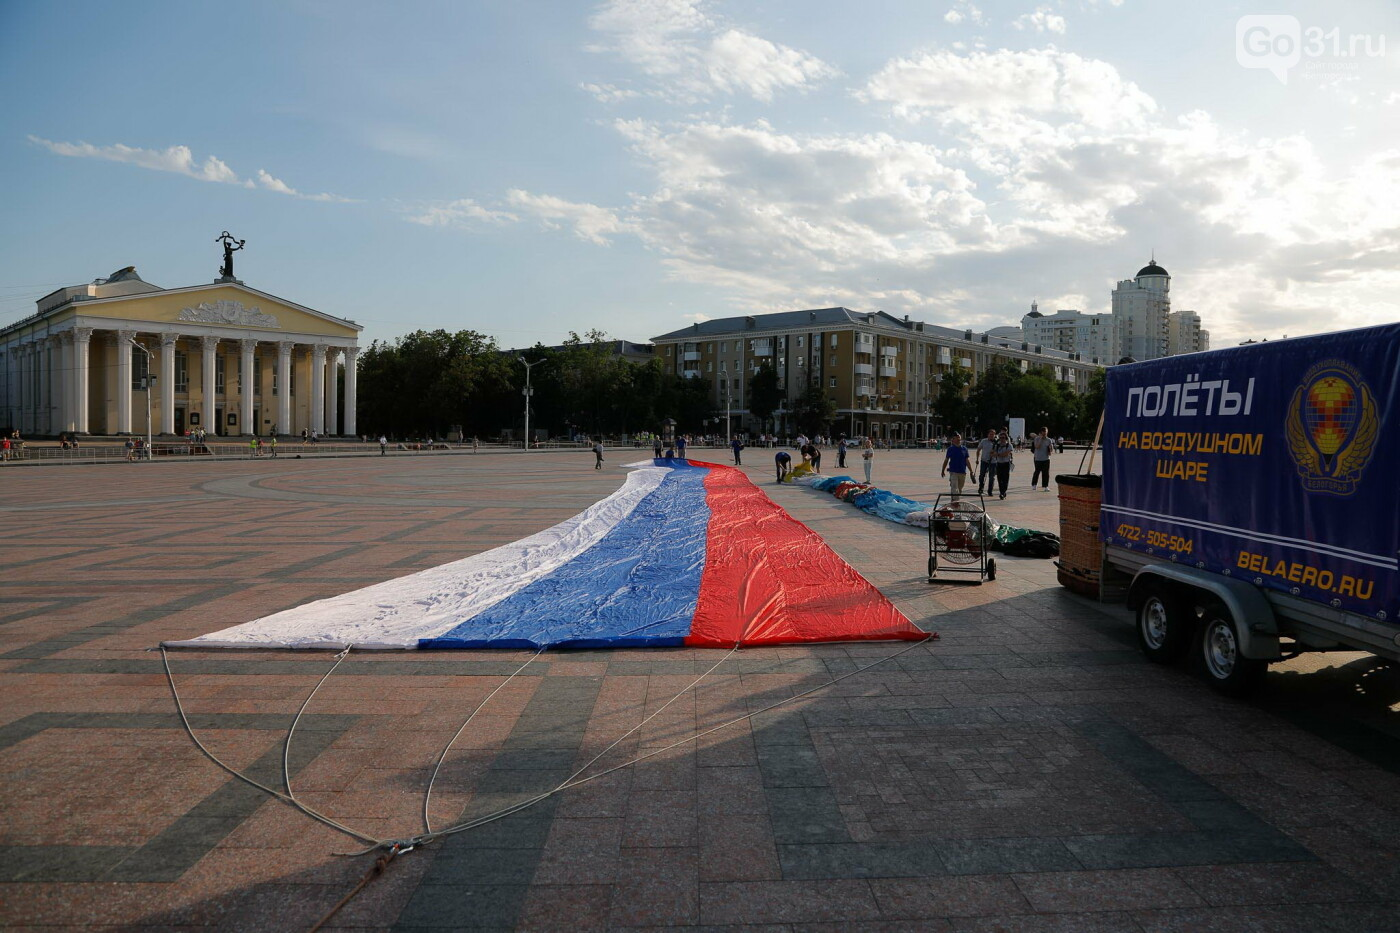 Над Белгородом пролетел аэростат с гигантским триколором, фото-11, Фото: Антон Вергун